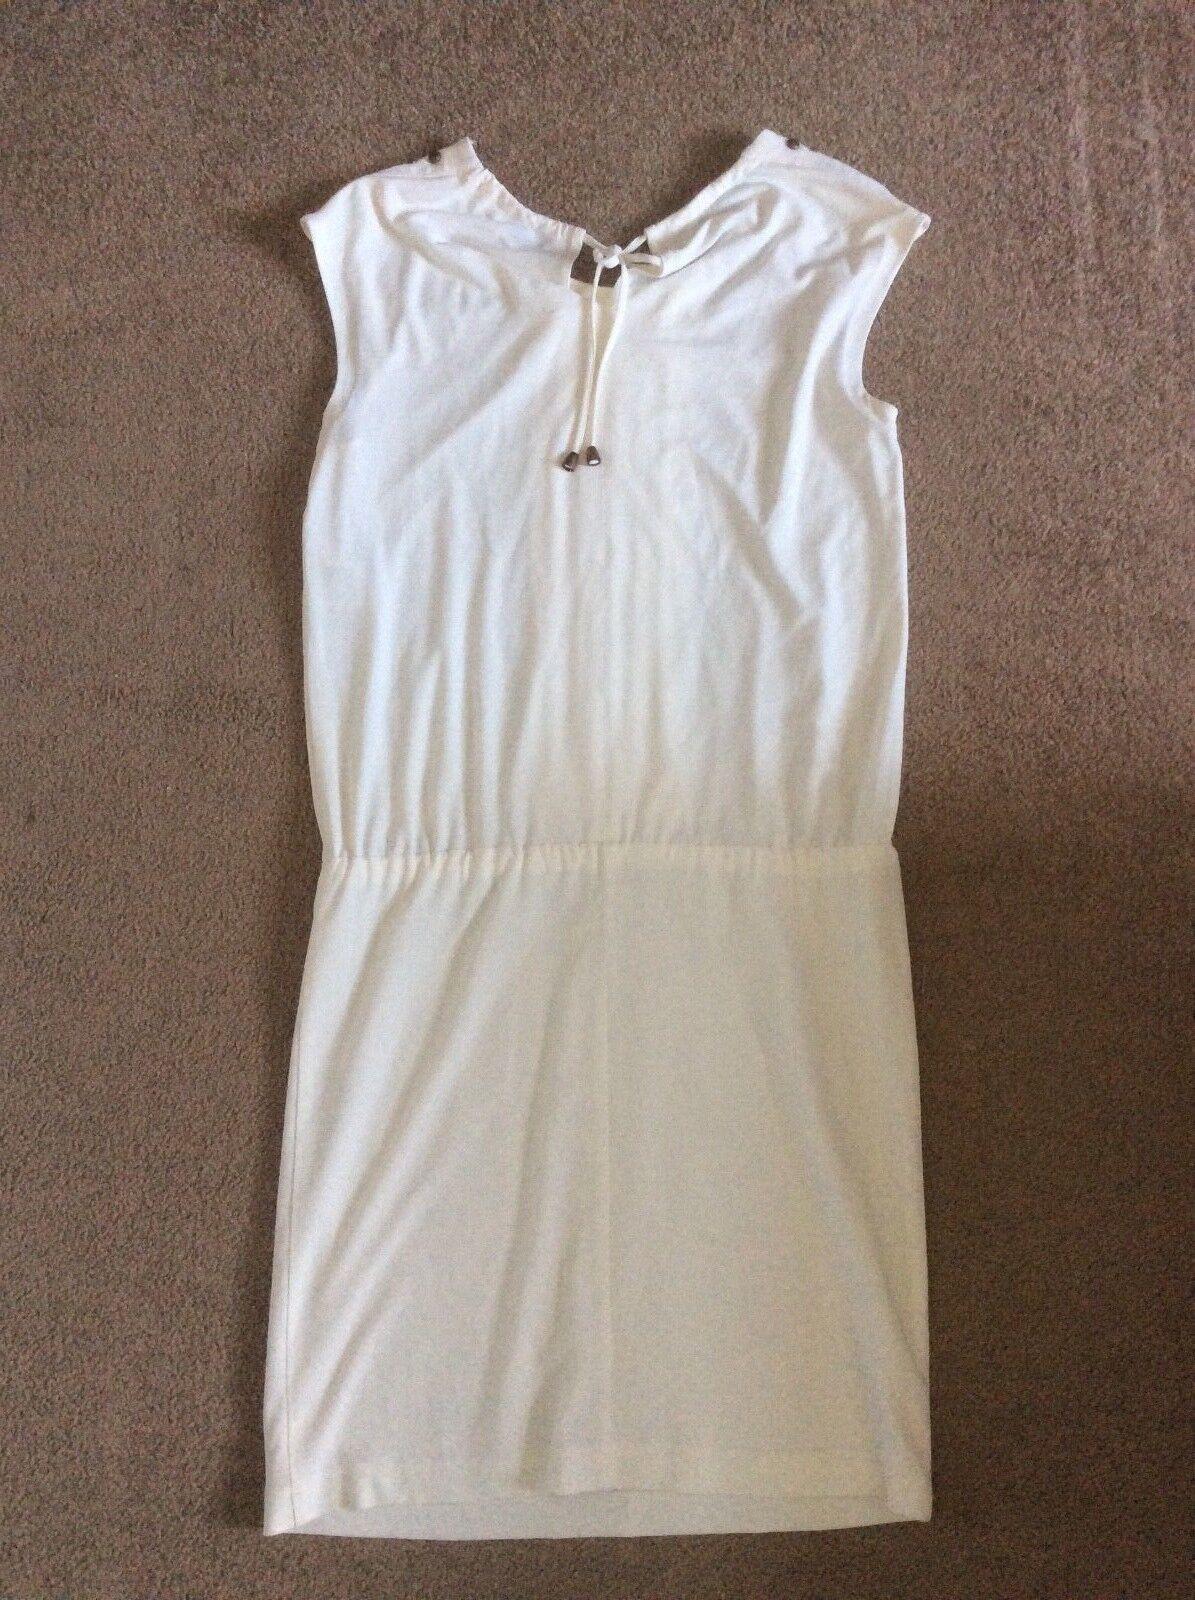 JEAN PAUL Kleid Gr. 38 38 38 | Kaufen  | Mode-Muster  | Erste in seiner Klasse  54ac60